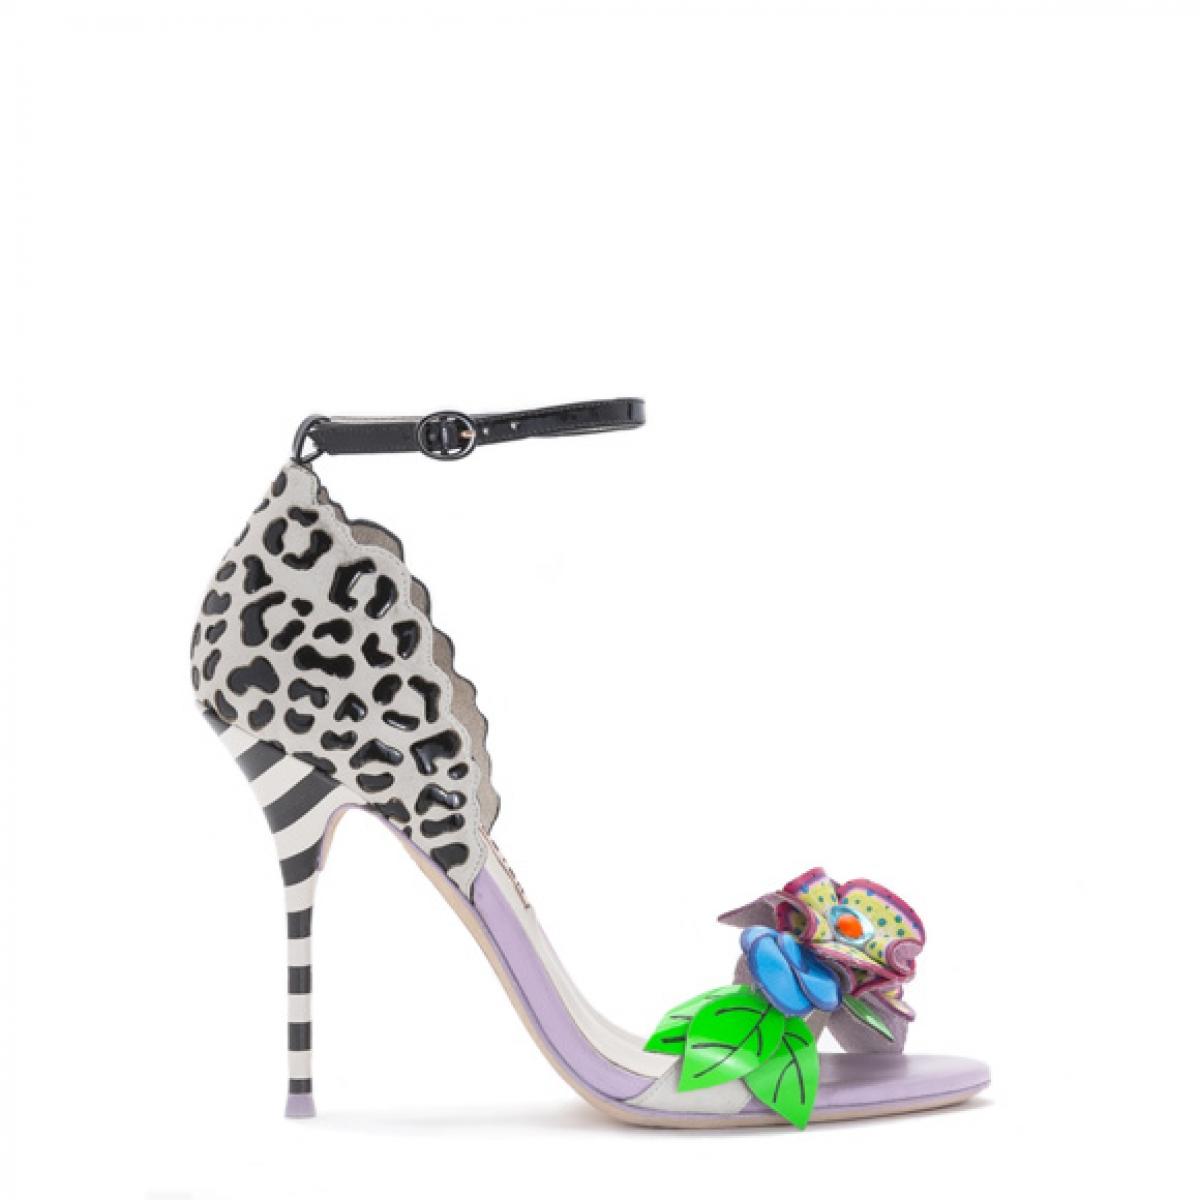 size 40 ff22b ca29e scarpe sophia webster - Shoeplay Fashion blog di scarpe da donna